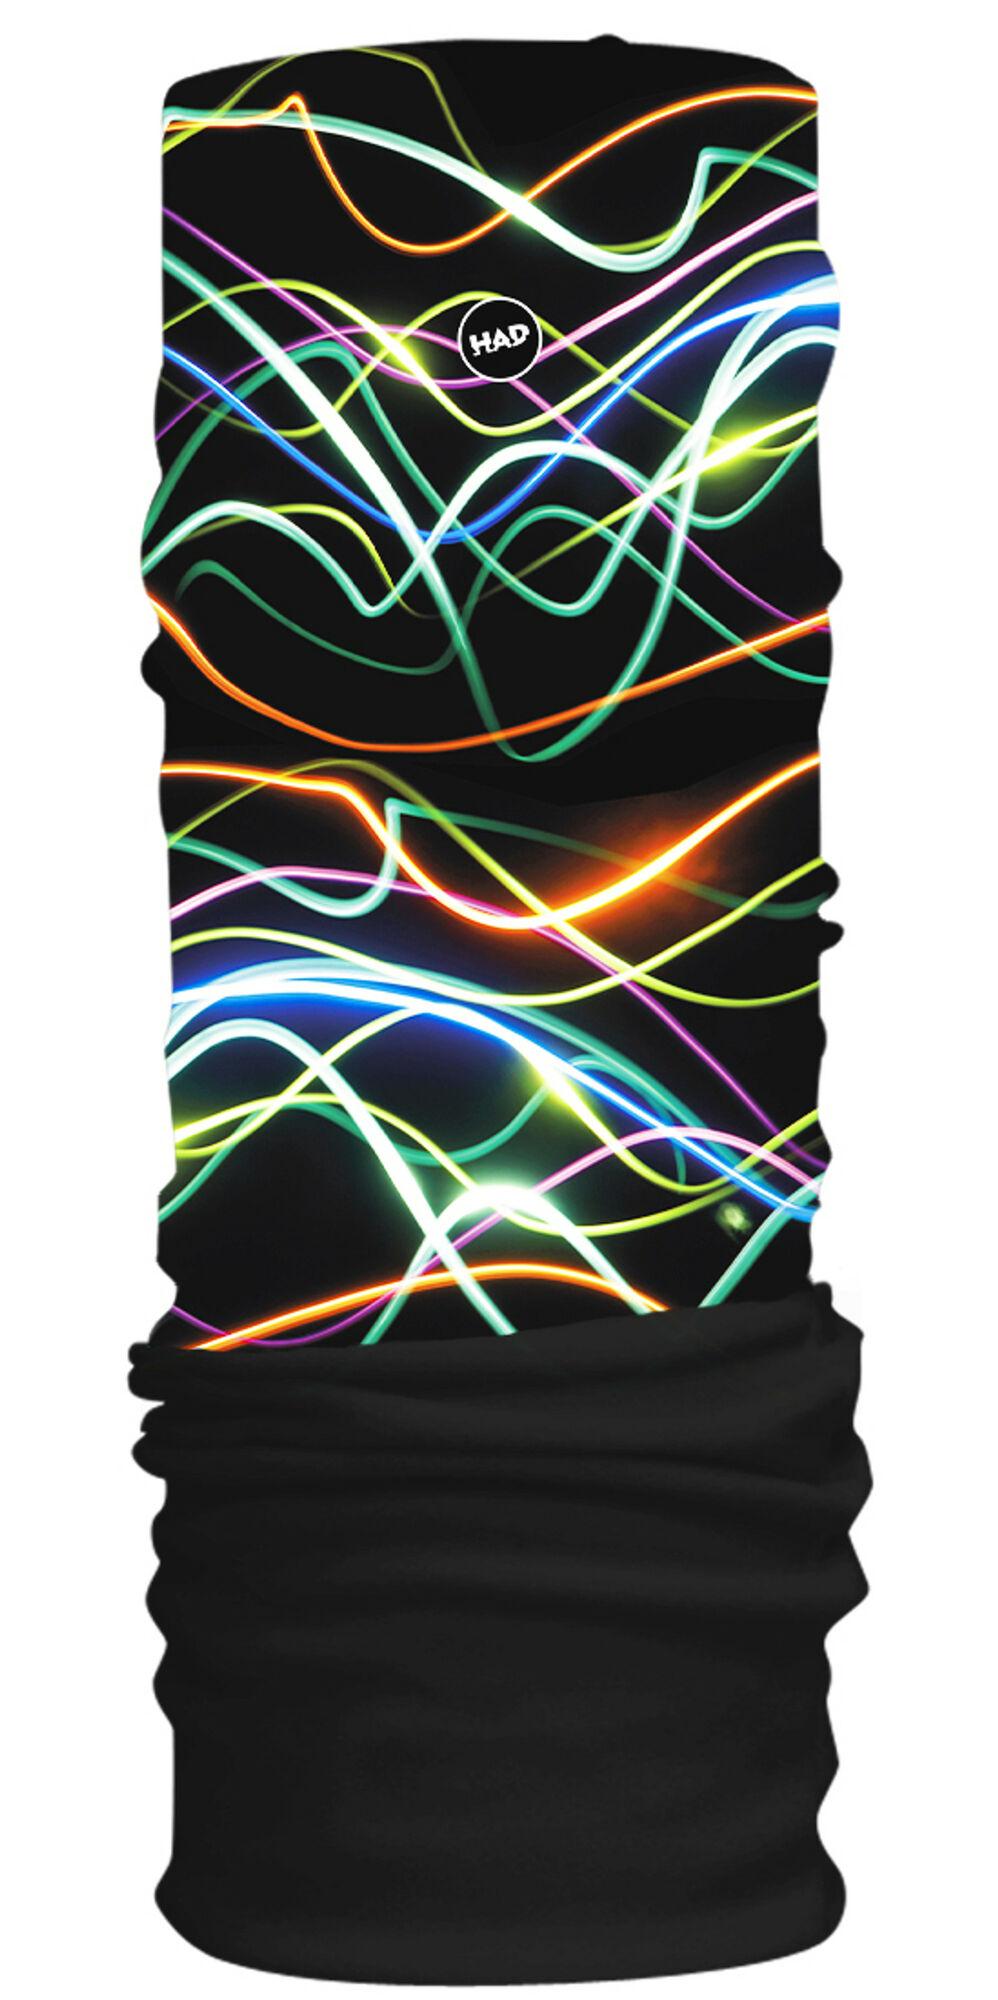 H.A.D. Originals Fleece Multifunktionstuch (Schwarz Neon)